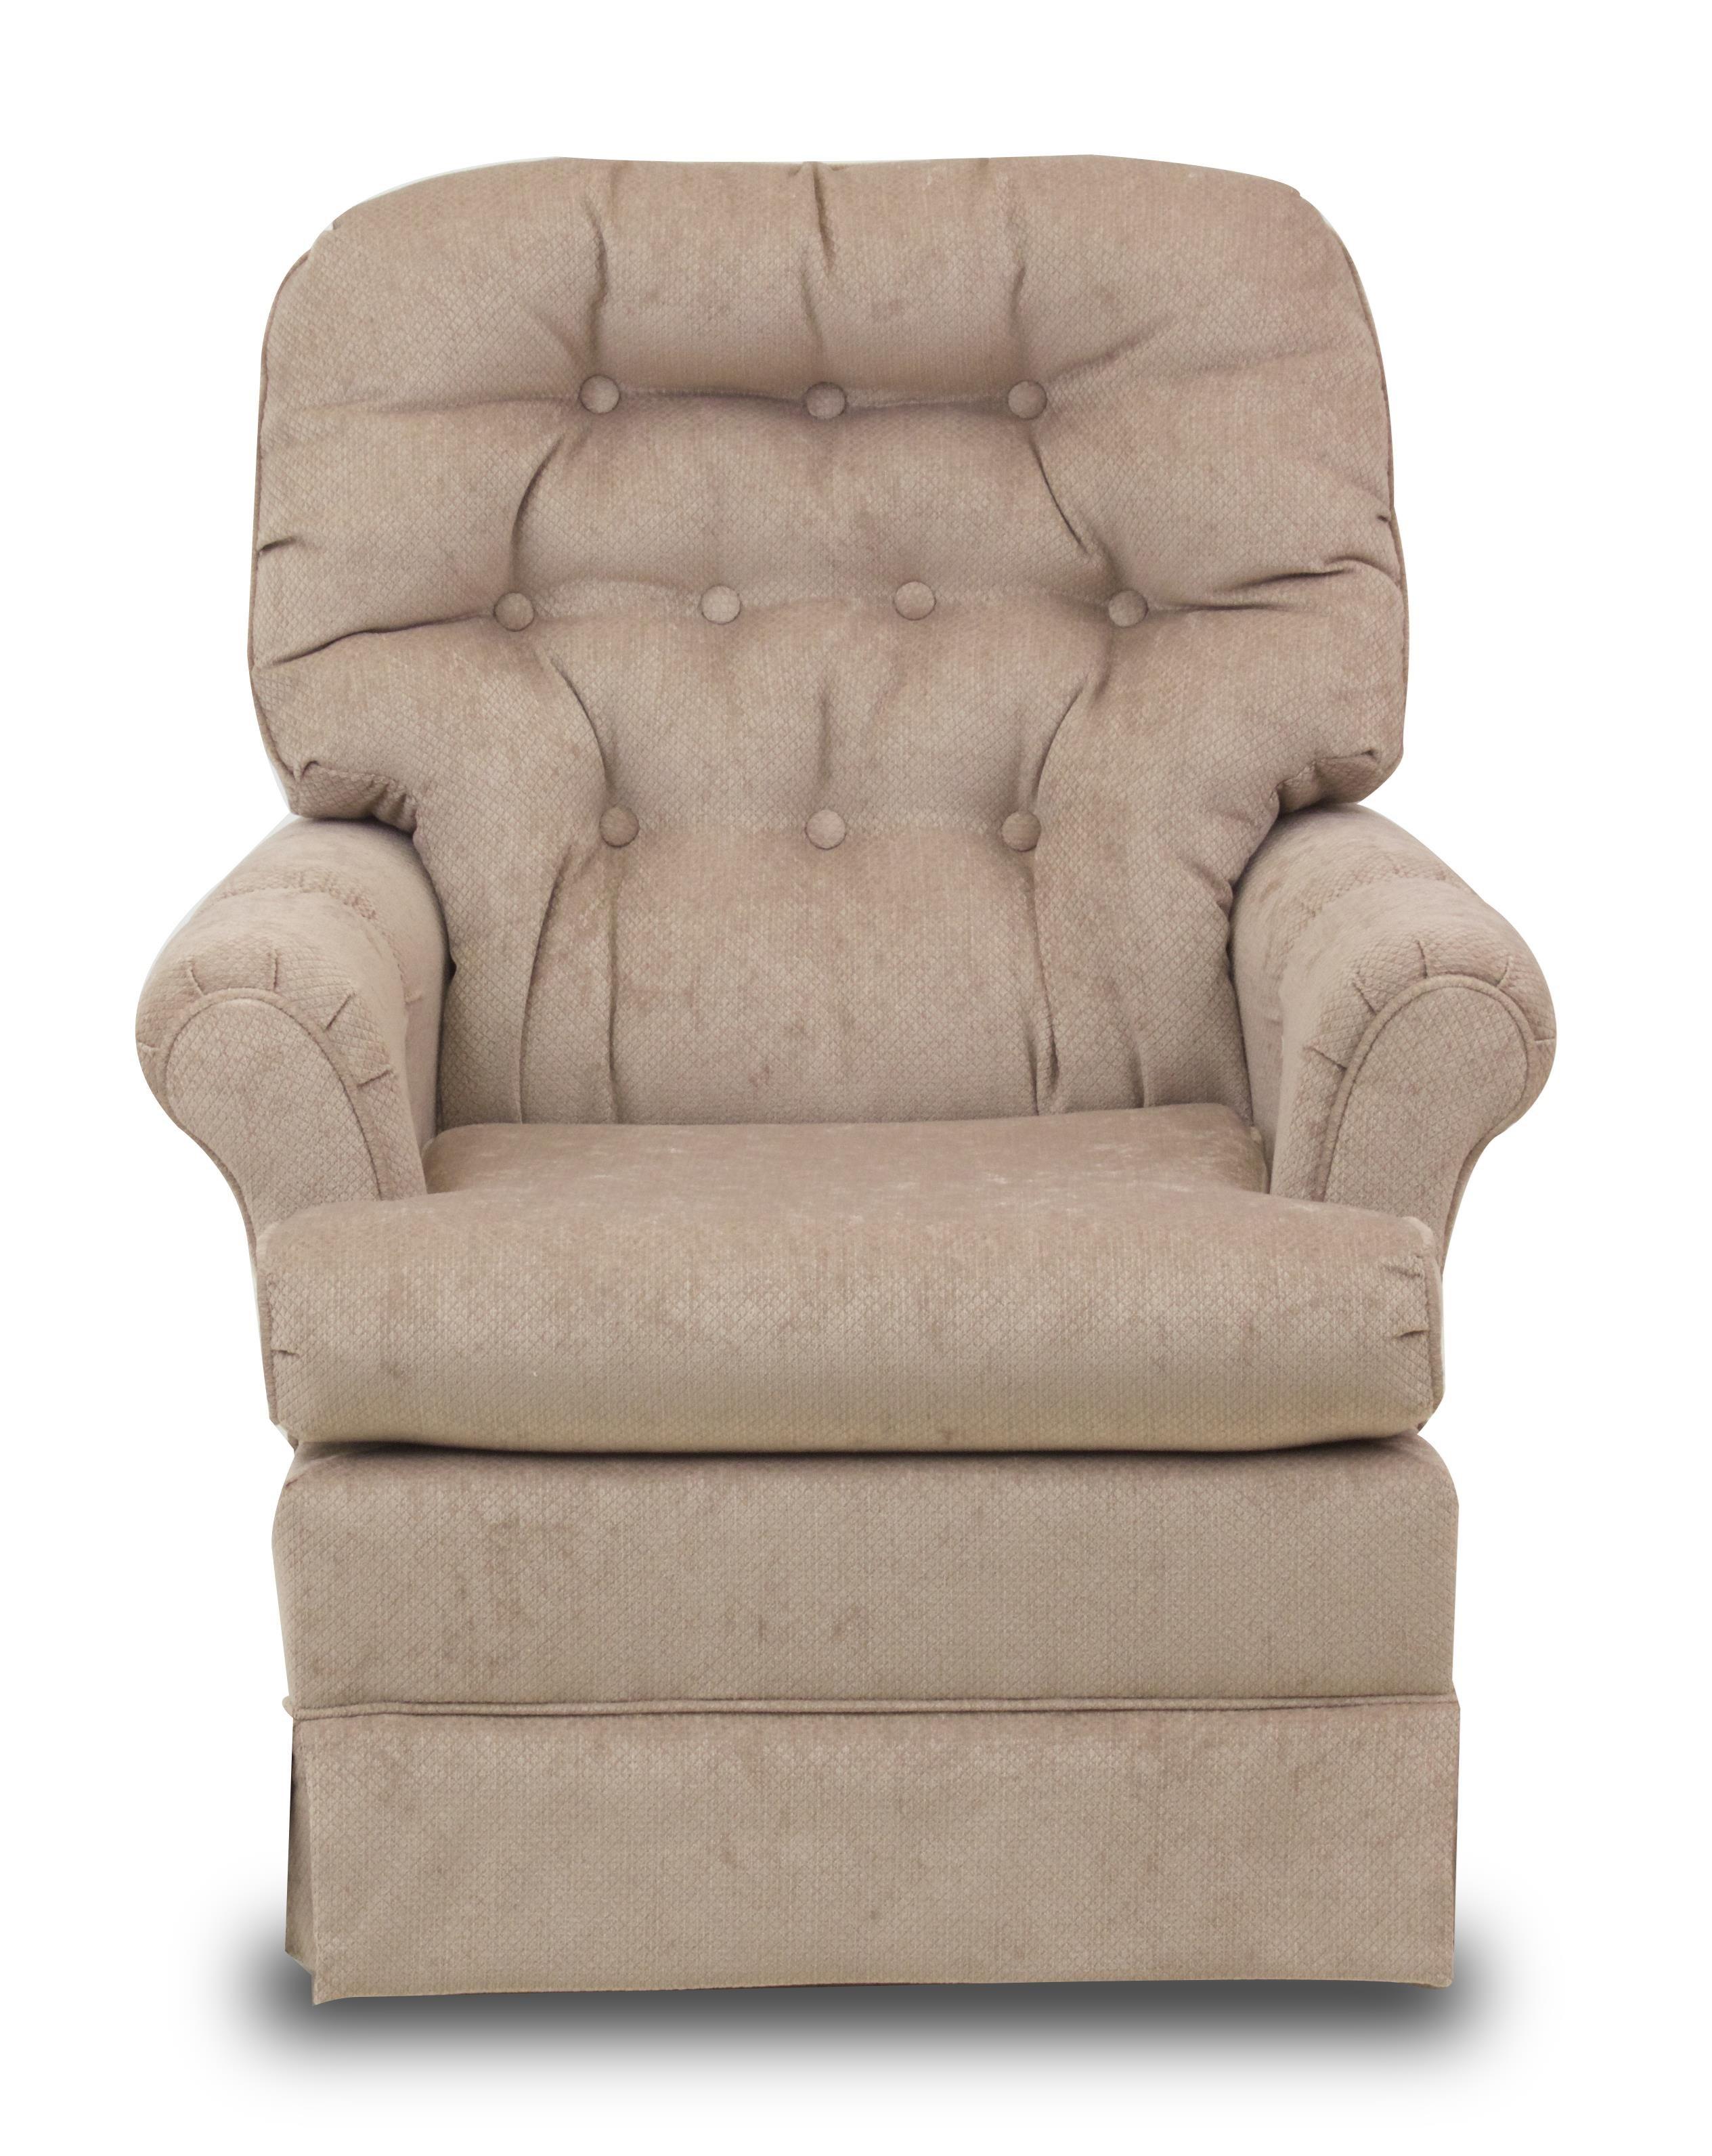 swivel upholstered chairs modern stacking glide marla rocker chair ruby gordon home